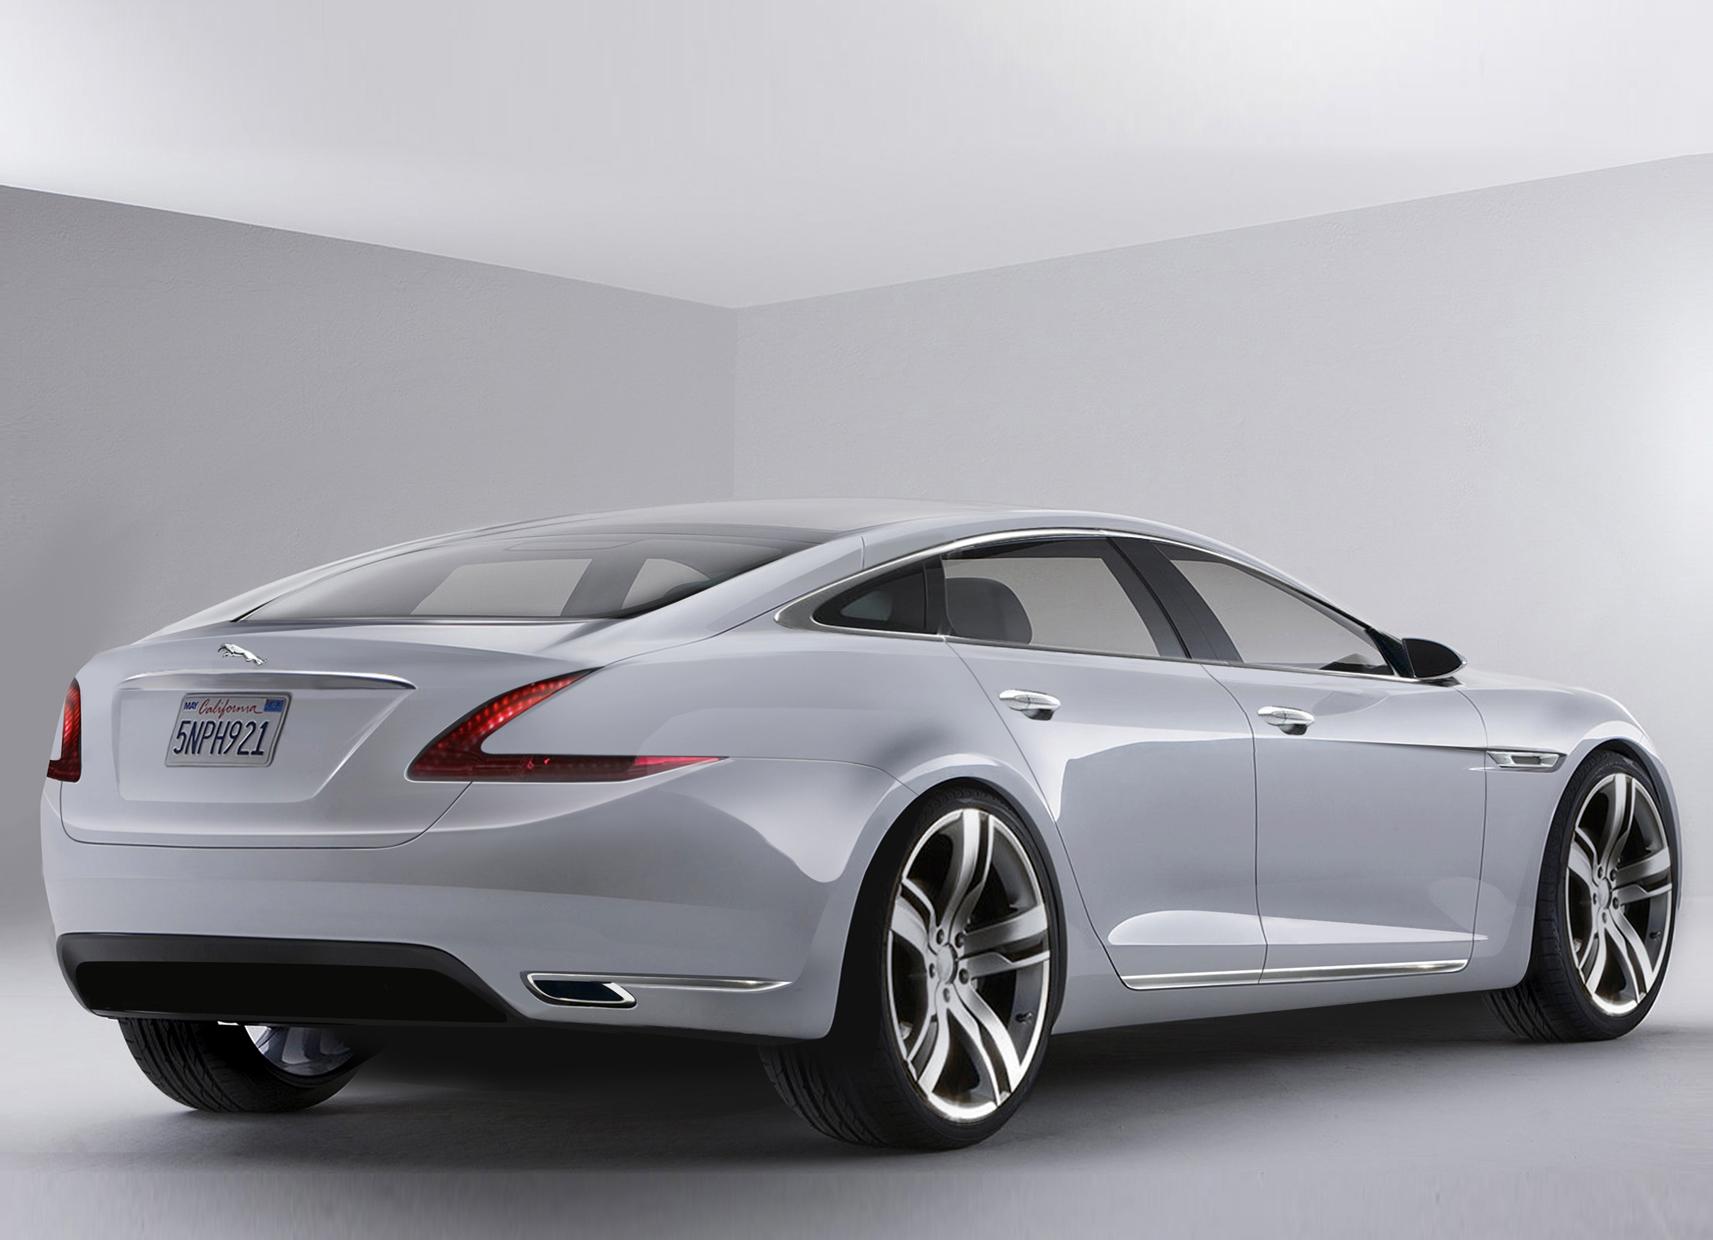 Jaguar Xs by matthew swann at Coroflot.com